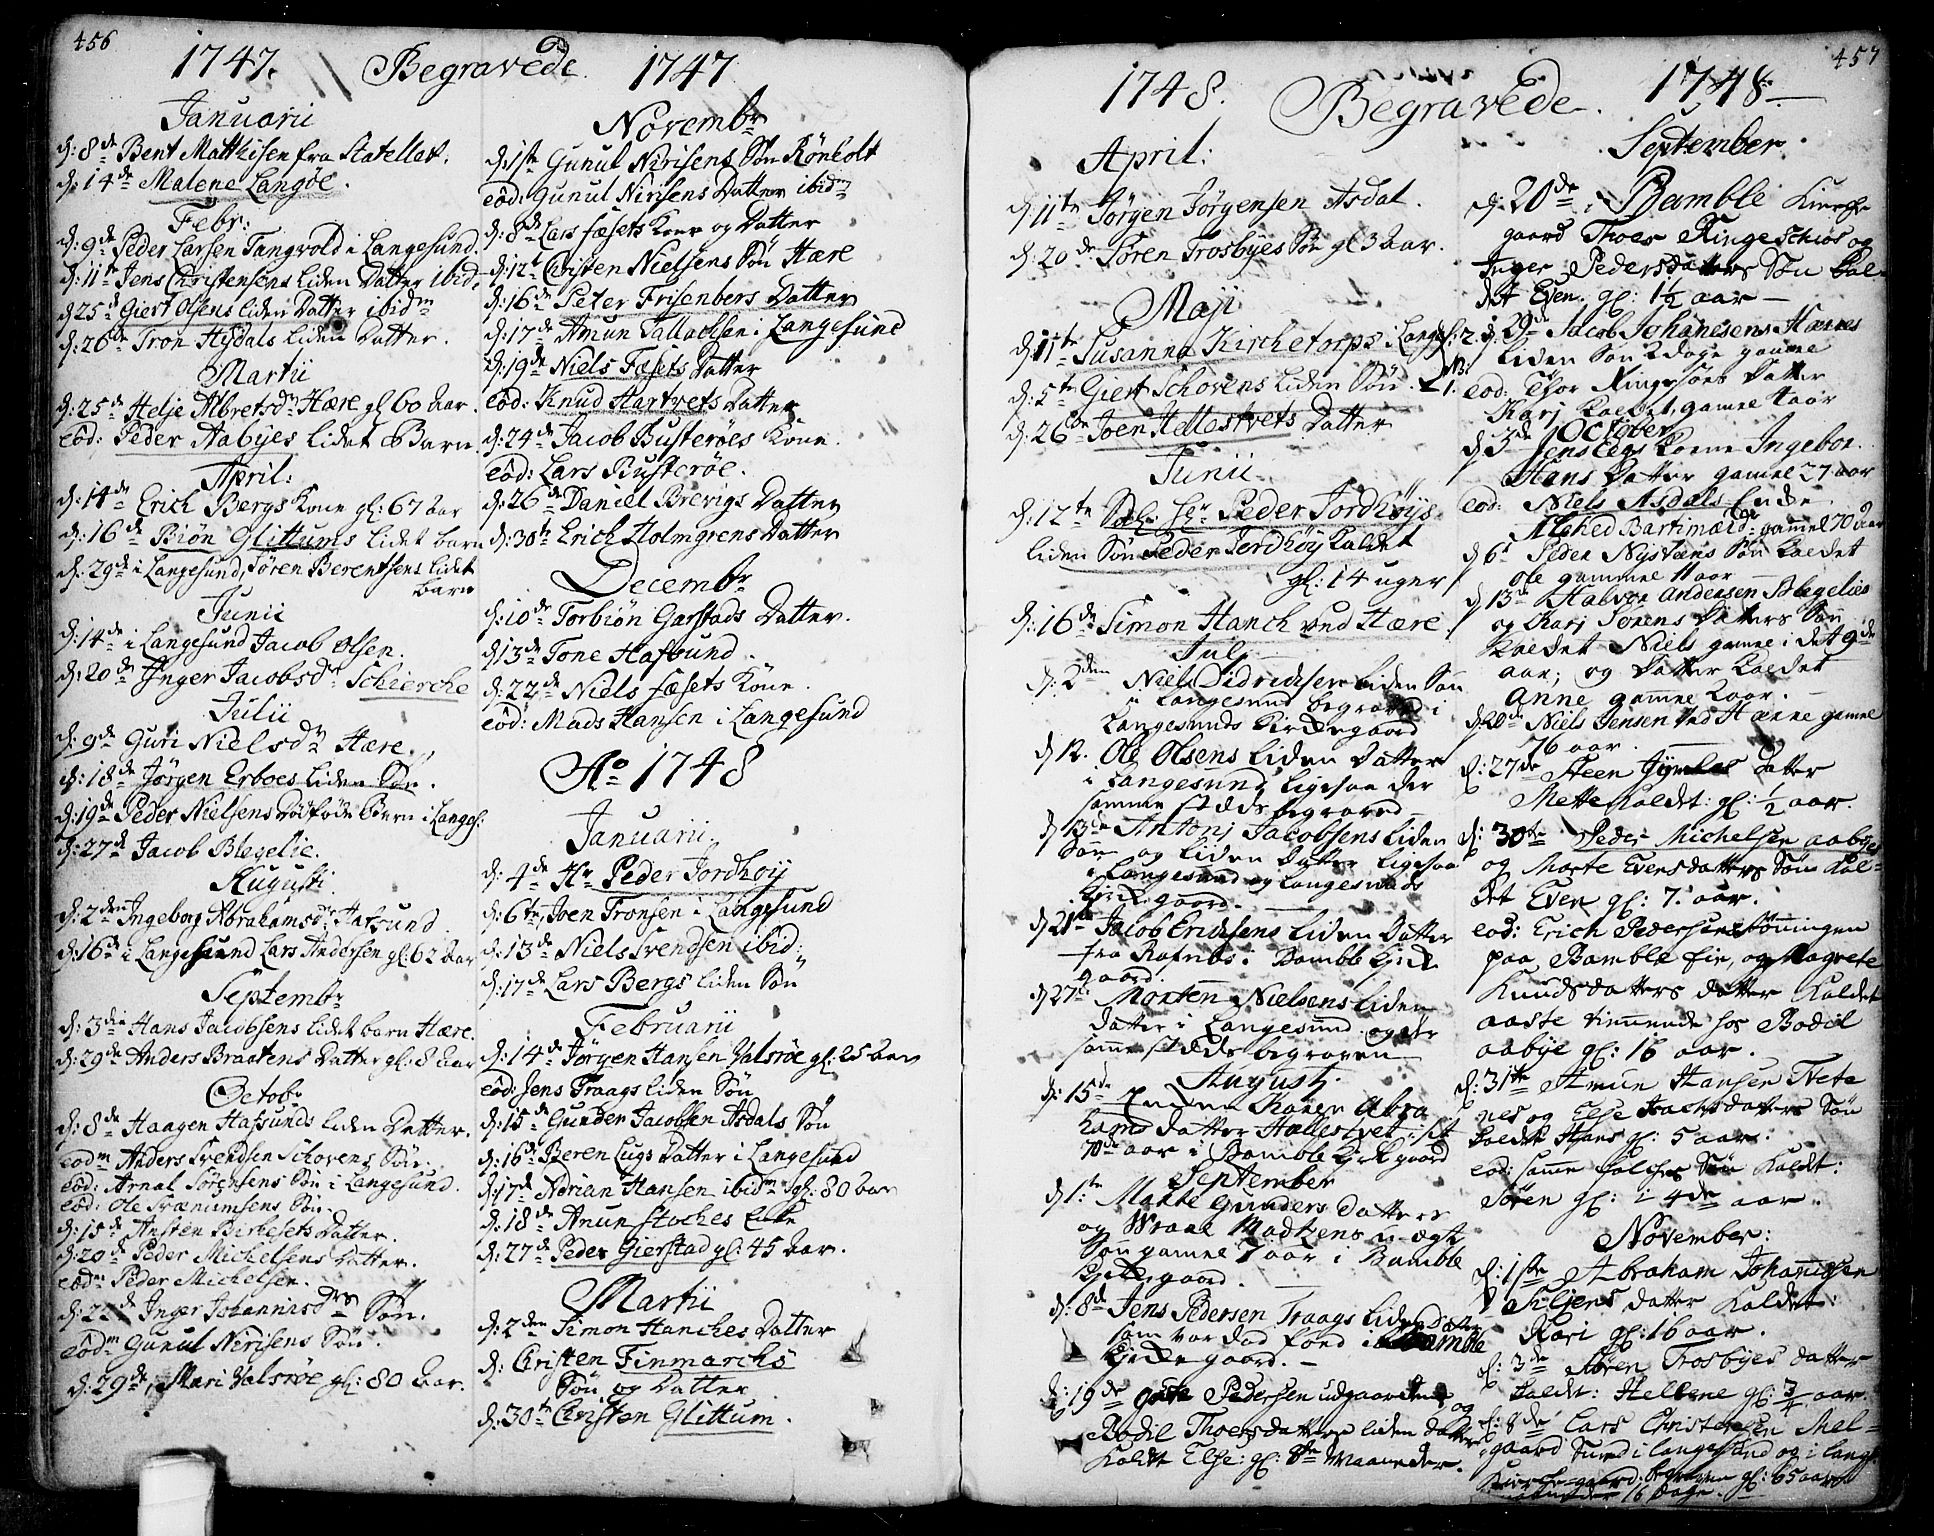 SAKO, Bamble kirkebøker, F/Fa/L0001: Ministerialbok nr. I 1, 1702-1774, s. 456-457